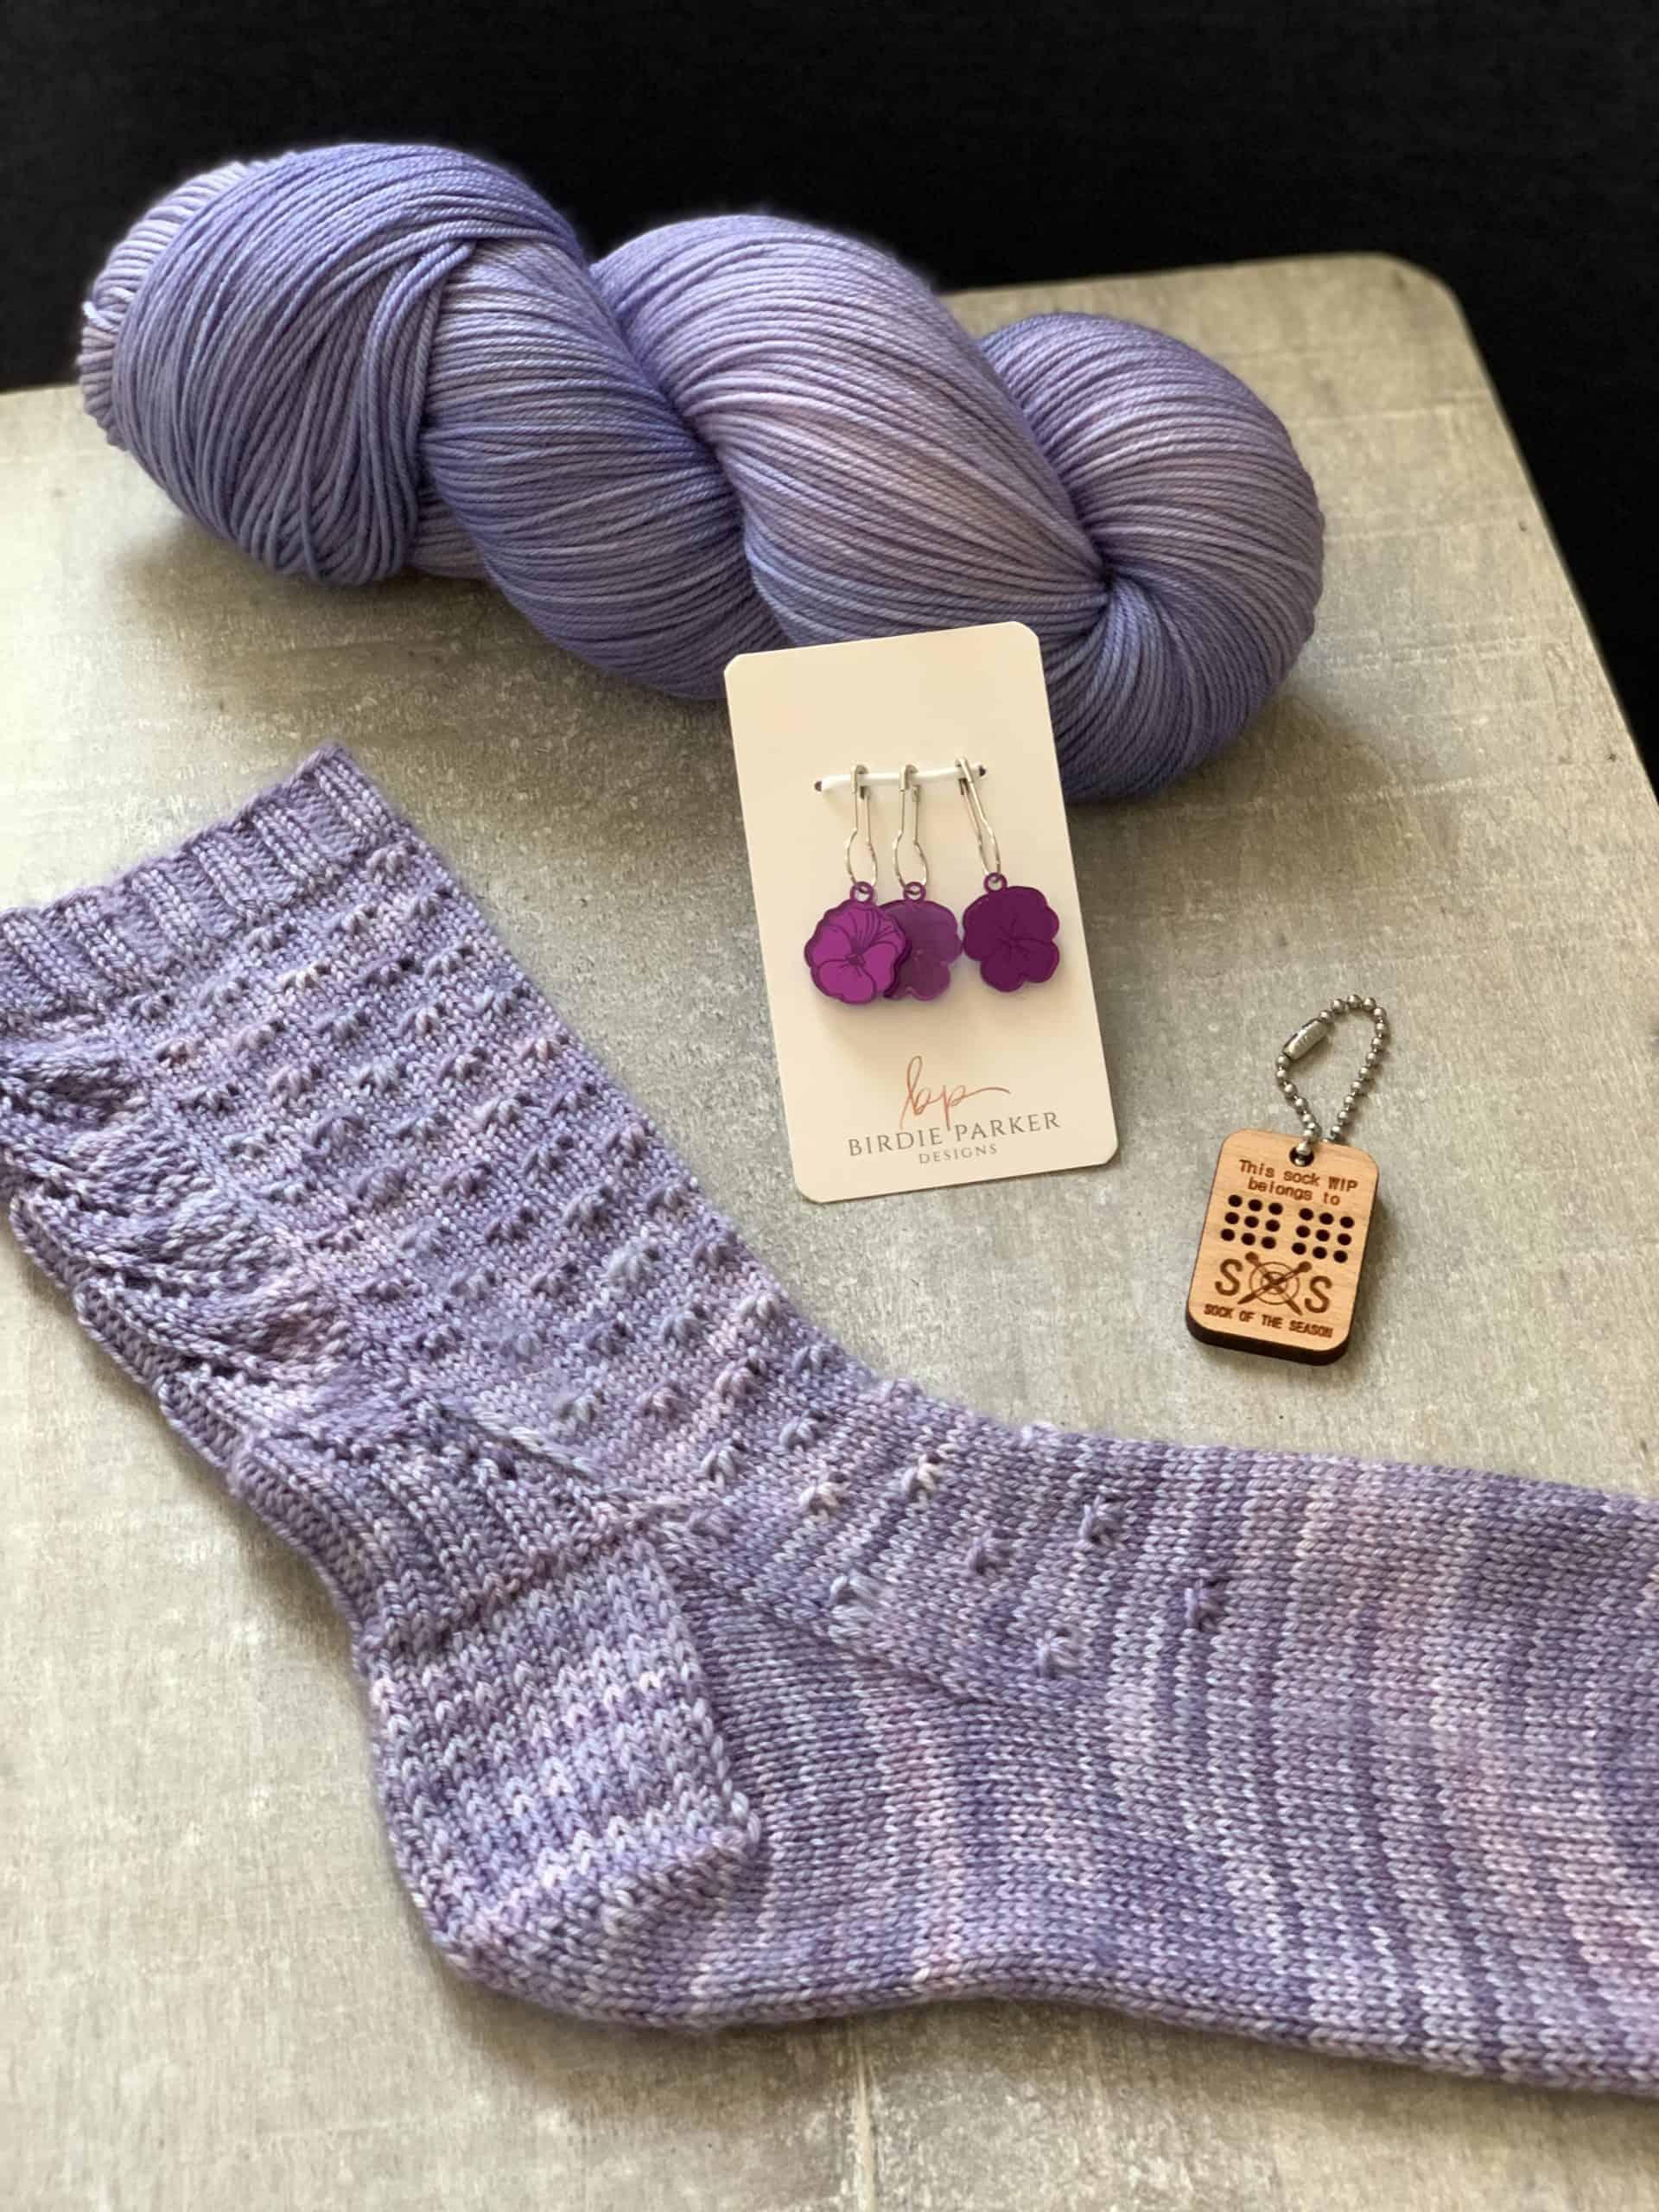 A lilac sock.